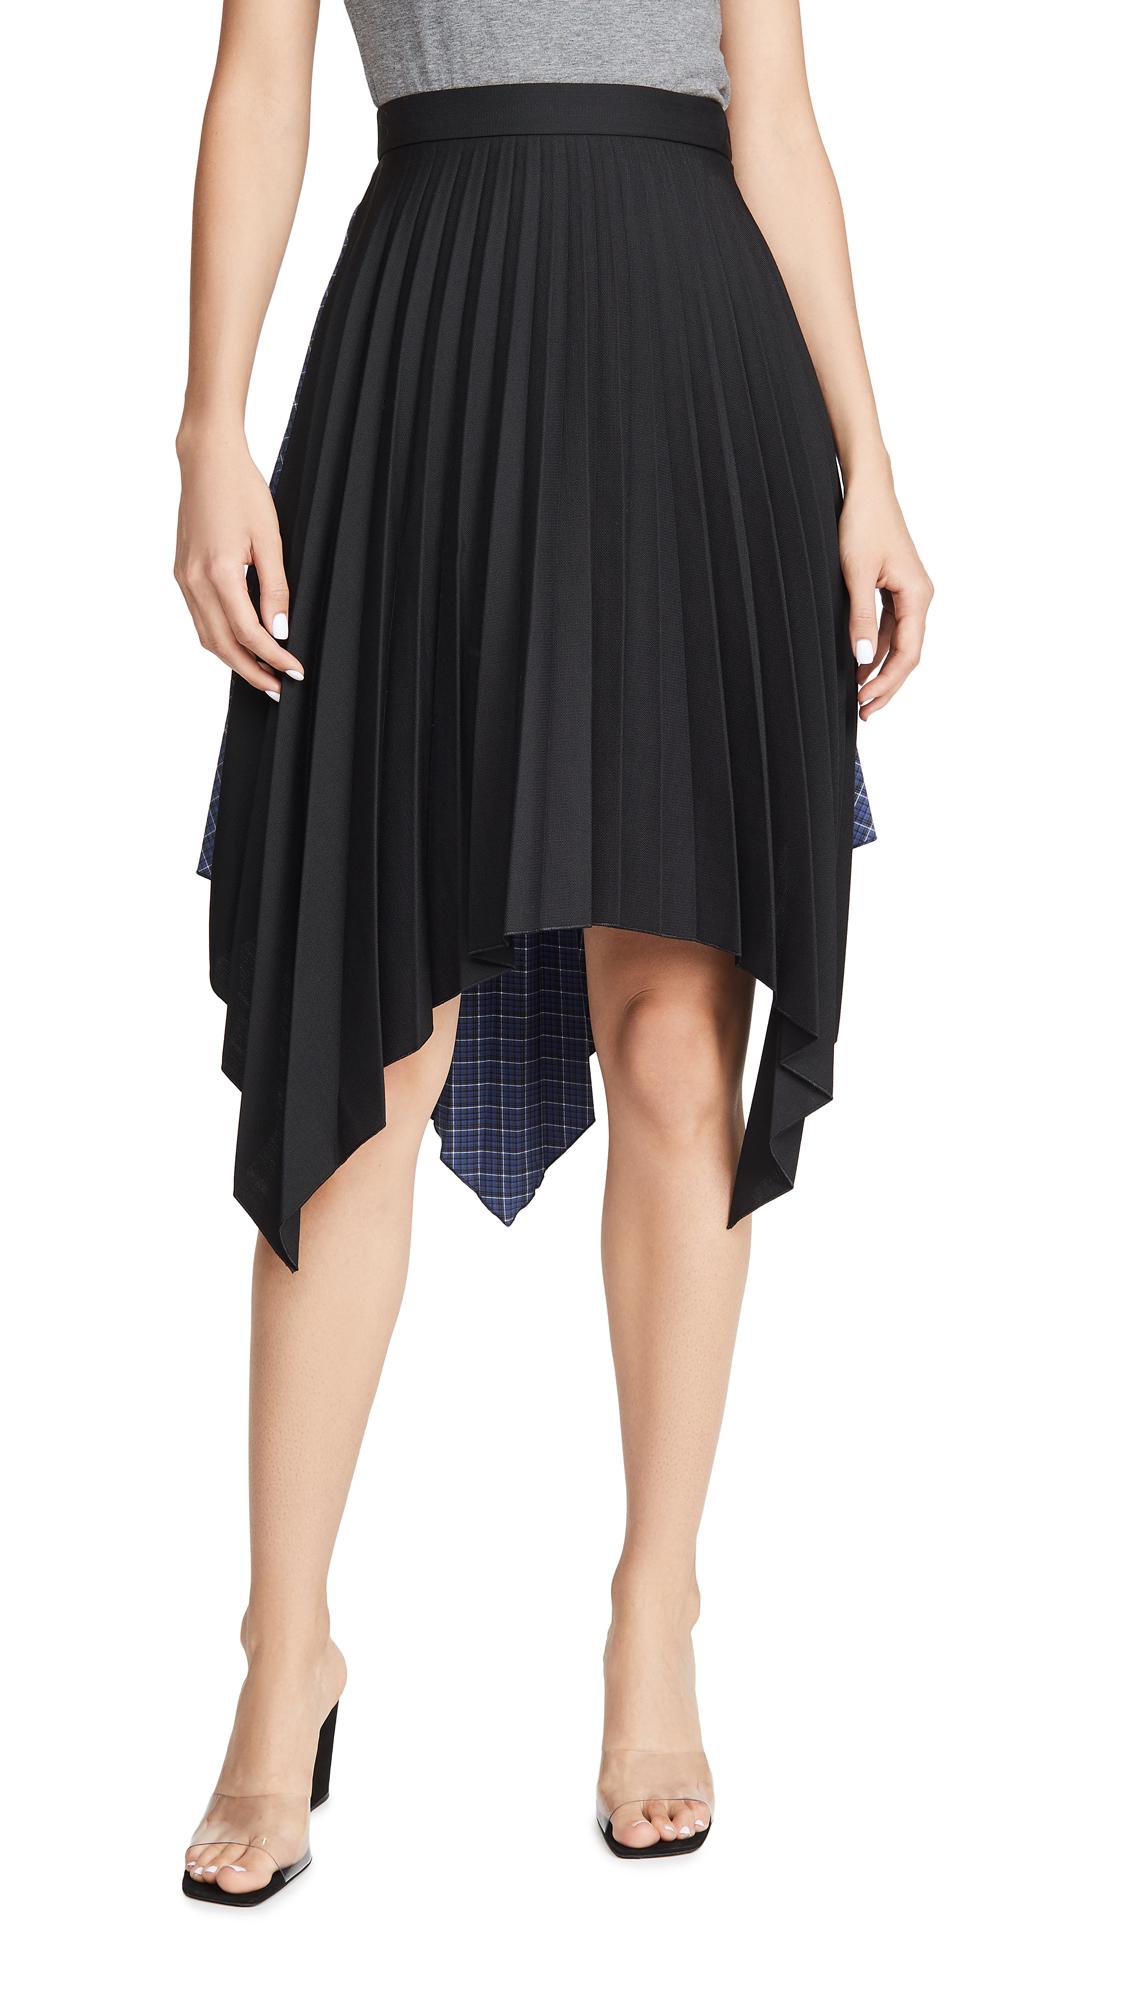 Acne Studios Ilsie Bico Suiting Skirt - Black